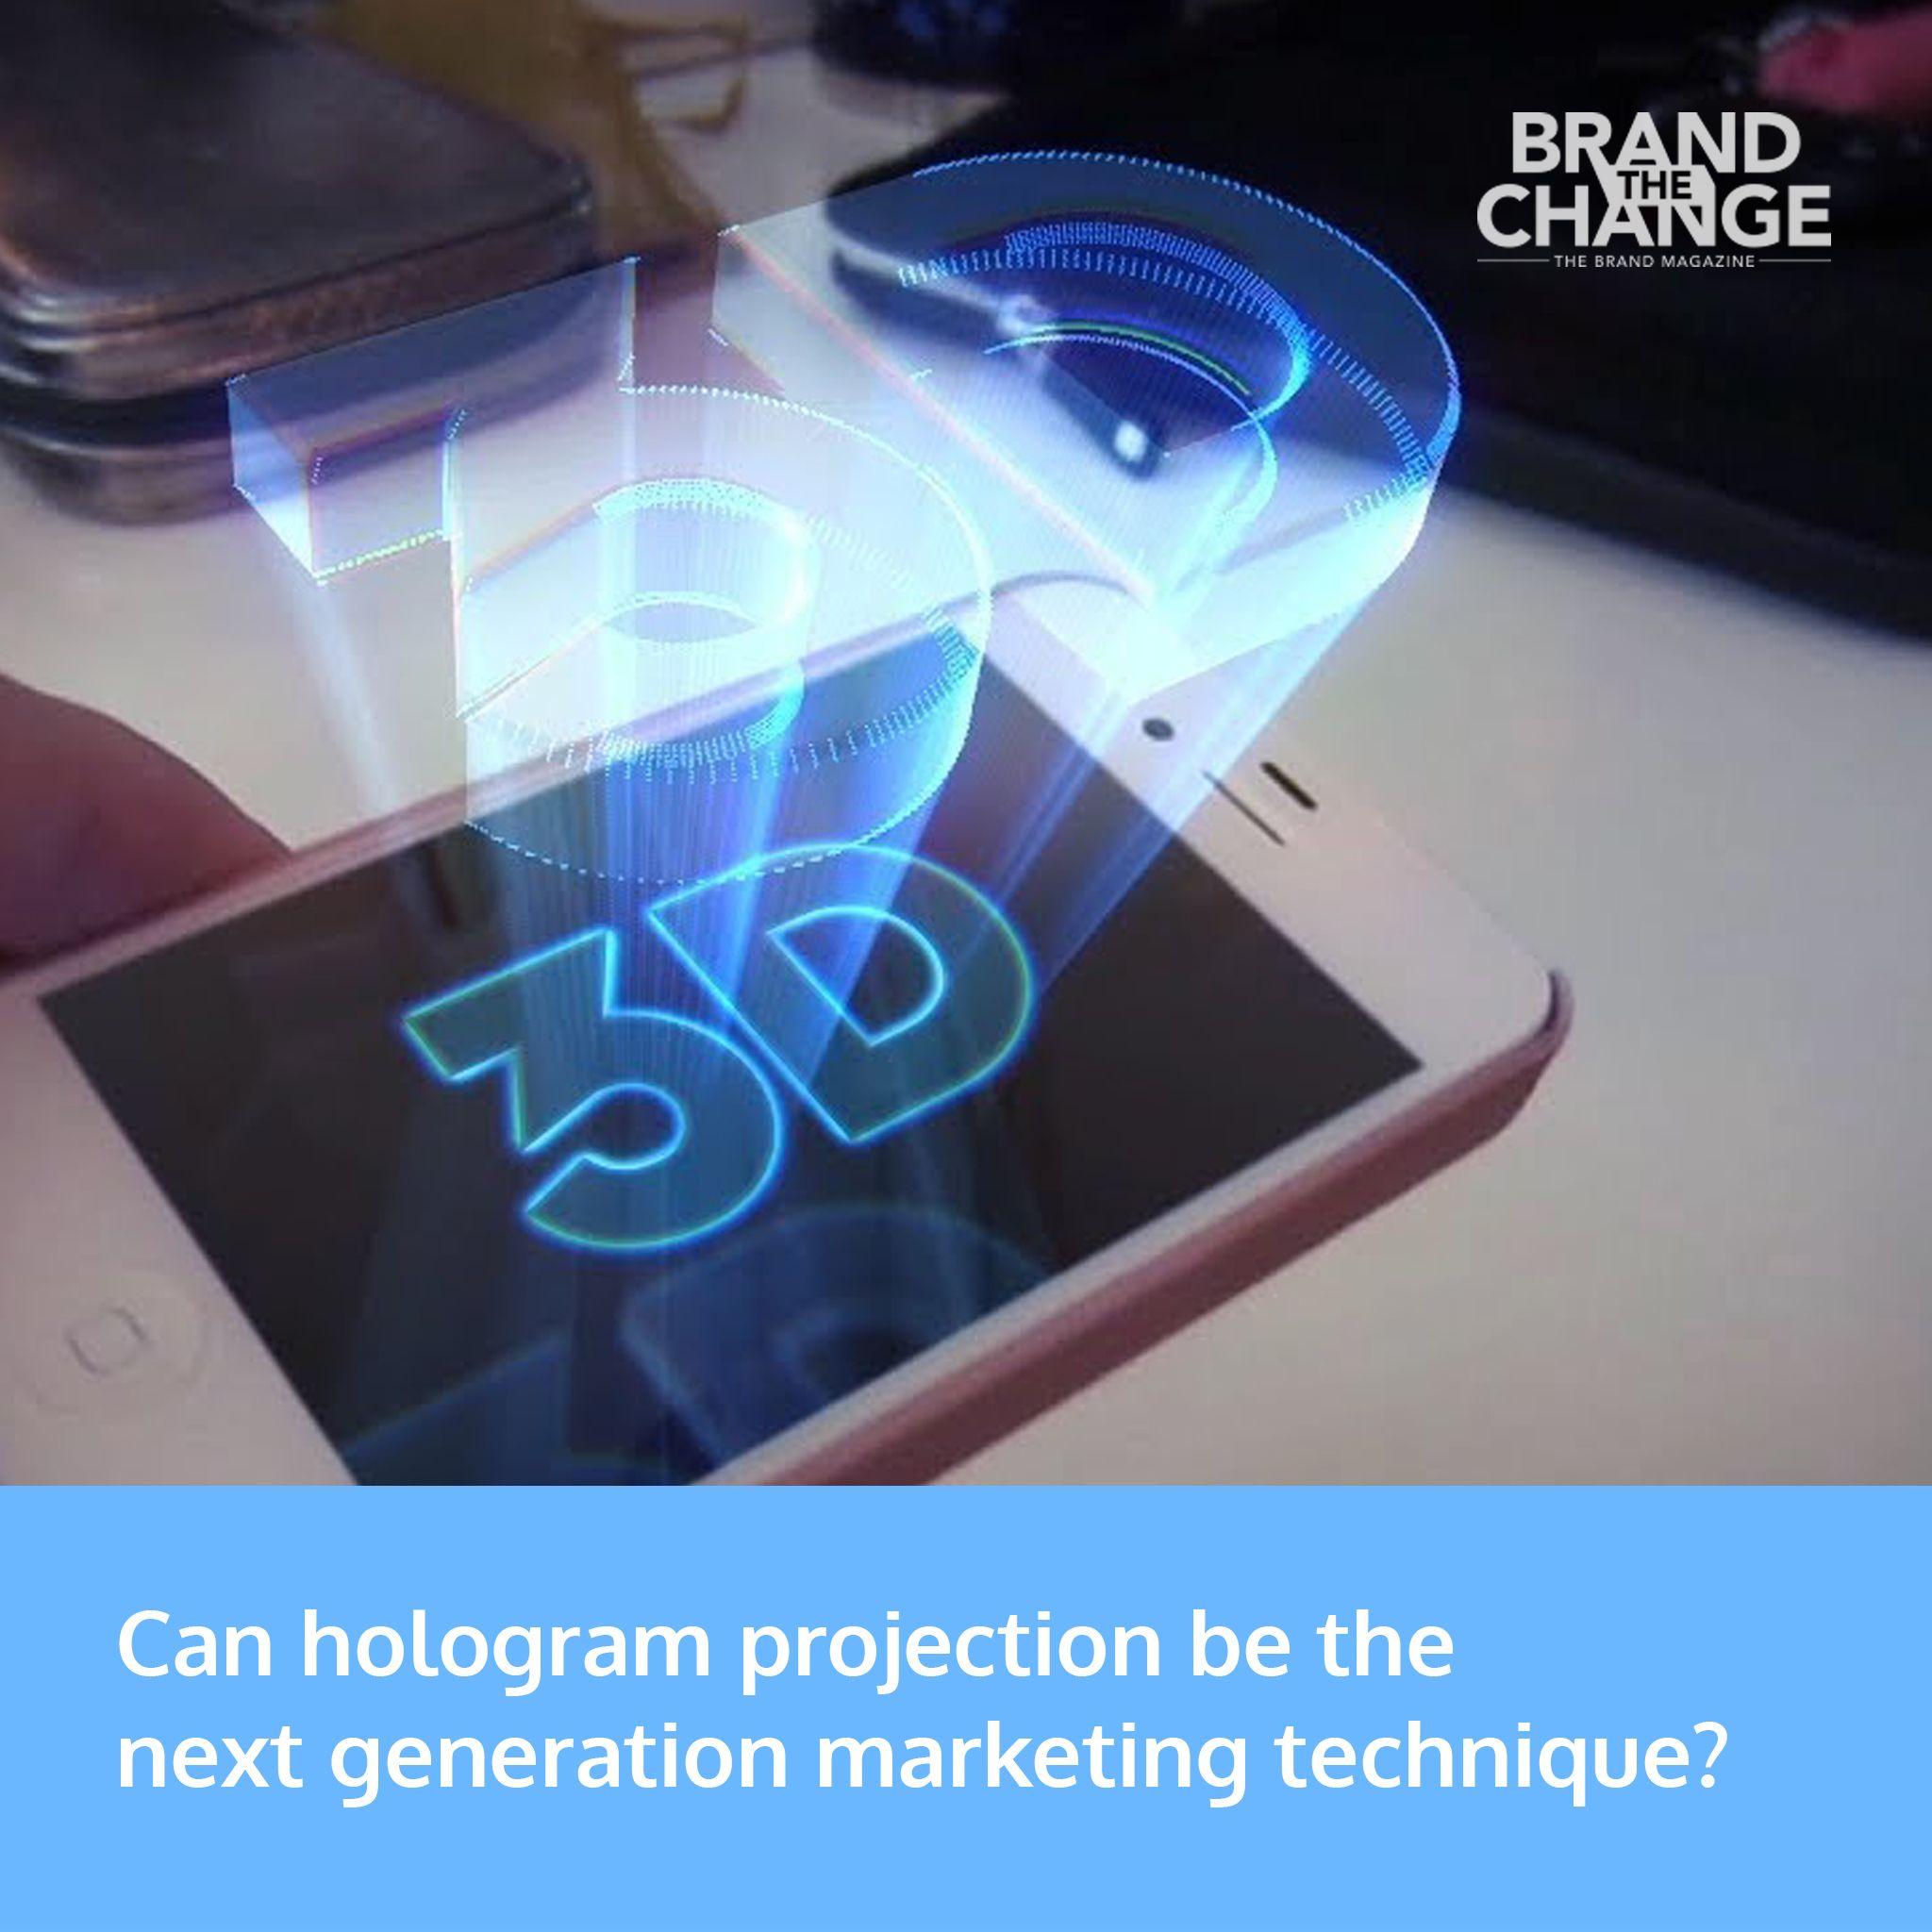 Can Hologram Projection Be The Next Generation Marketing Technique Digitaltechnology Hologram Futuretech Hologram Projection Marketing Techniques Hologram